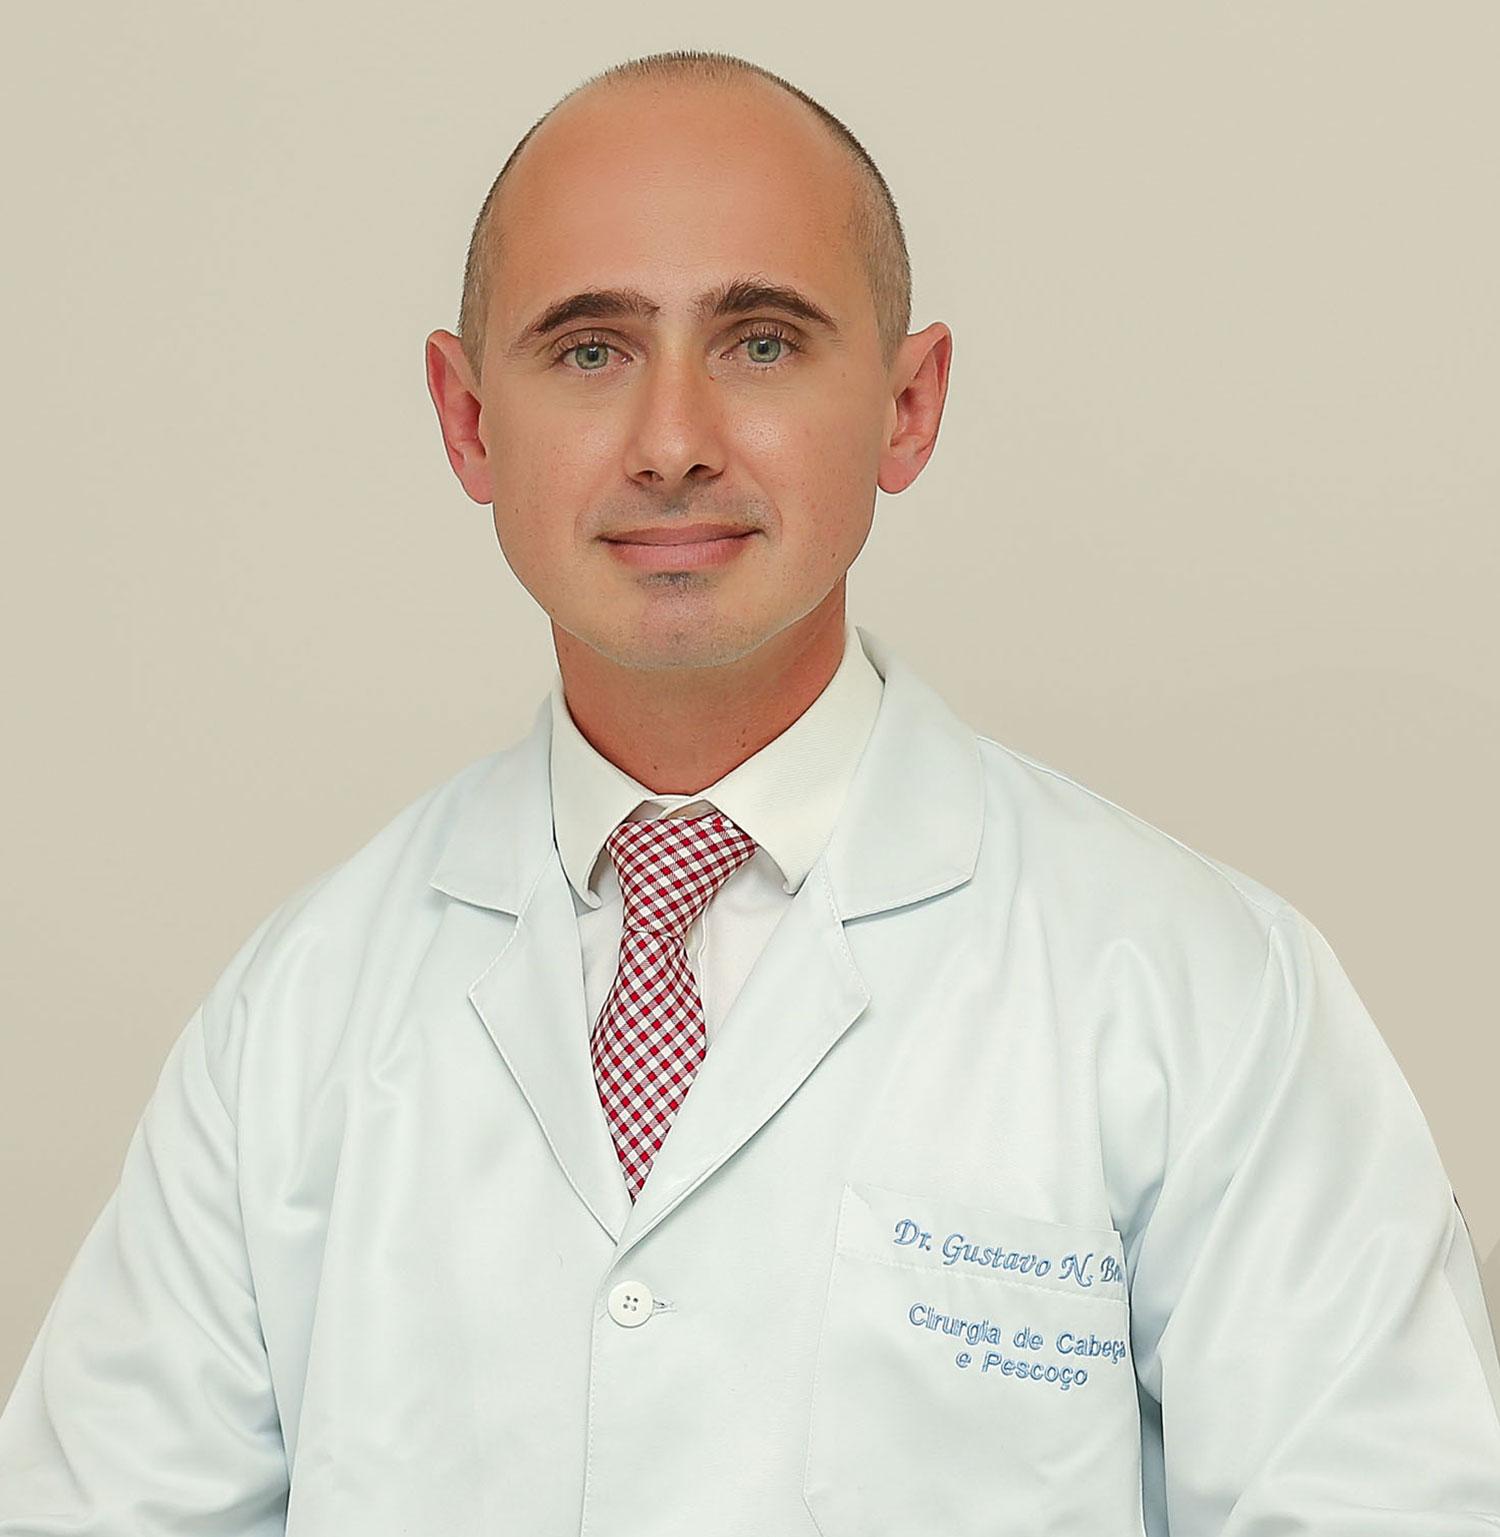 Dr. Gustavo Bento